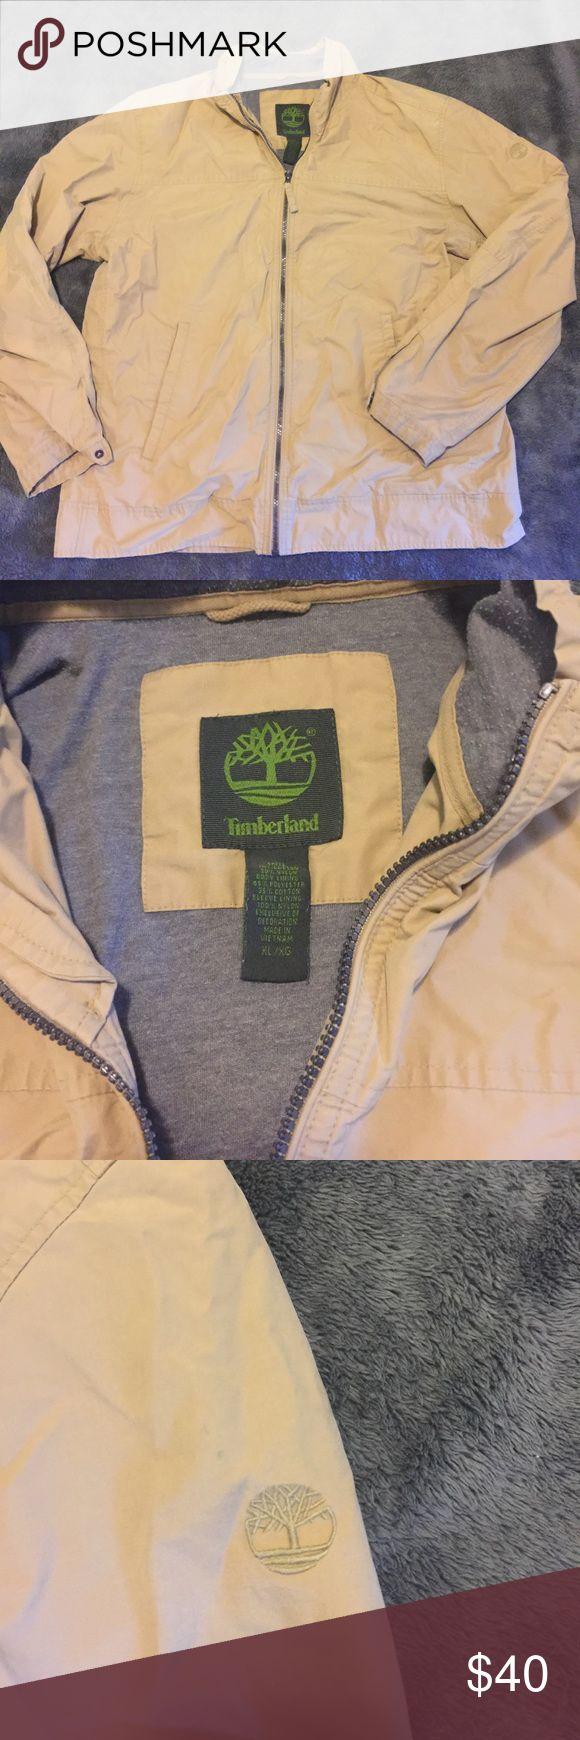 Timberland jacket. Men's XL Really nice tan Timberland jacket. Men's size XL. Great condition. Too small for me. ☹️🌲🌲 Timberland Jackets & Coats Lightweight & Shirt Jackets